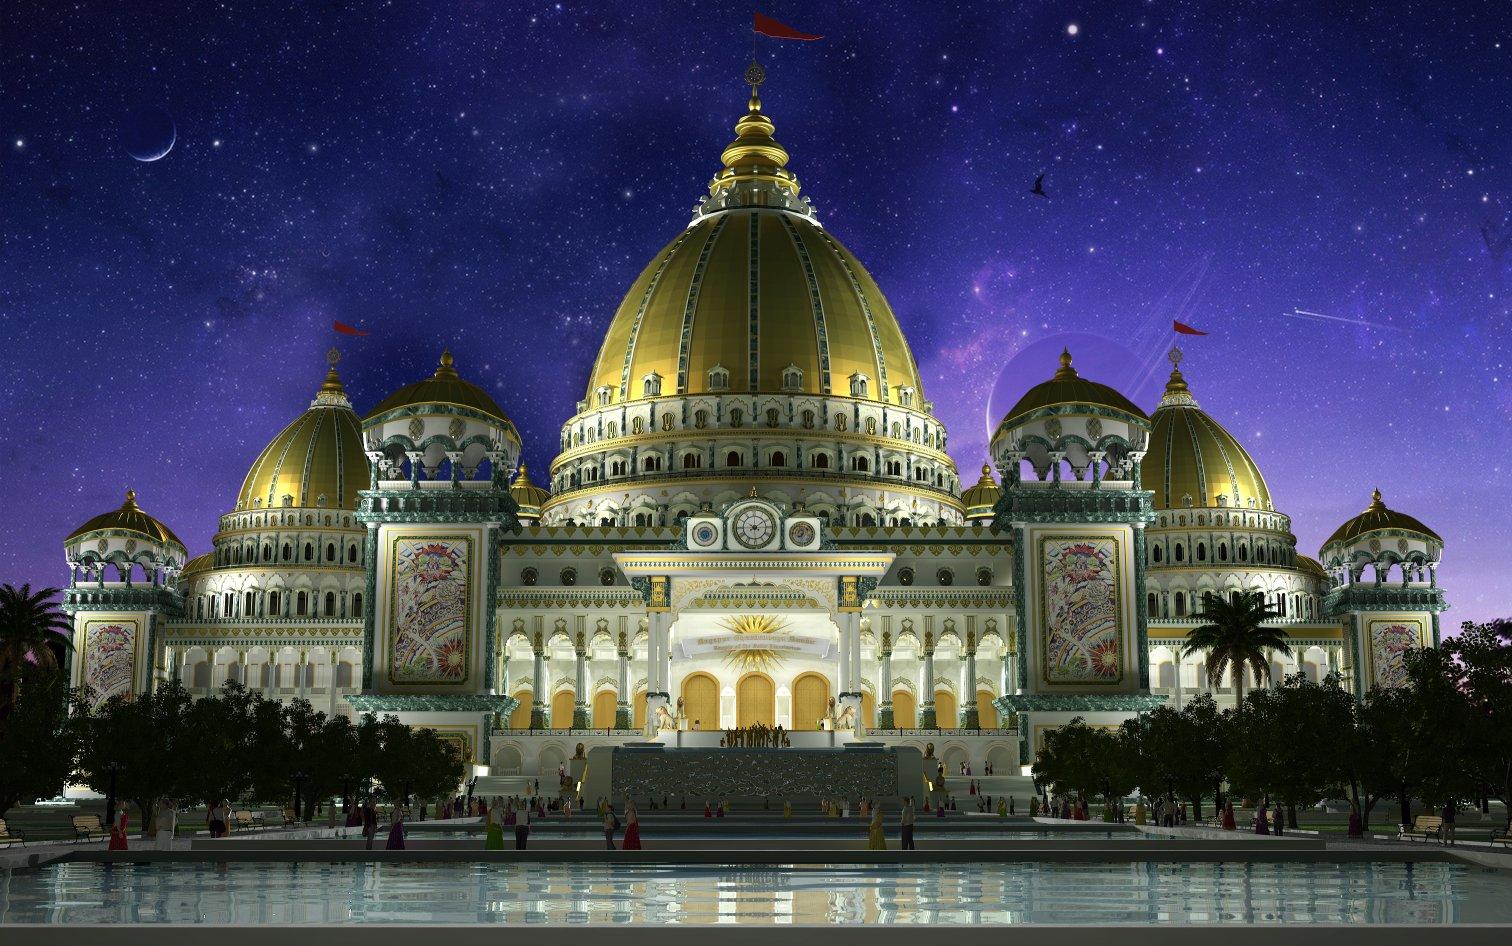 Temple of the Vedic Planetarium - Sri Mayapura Dhama